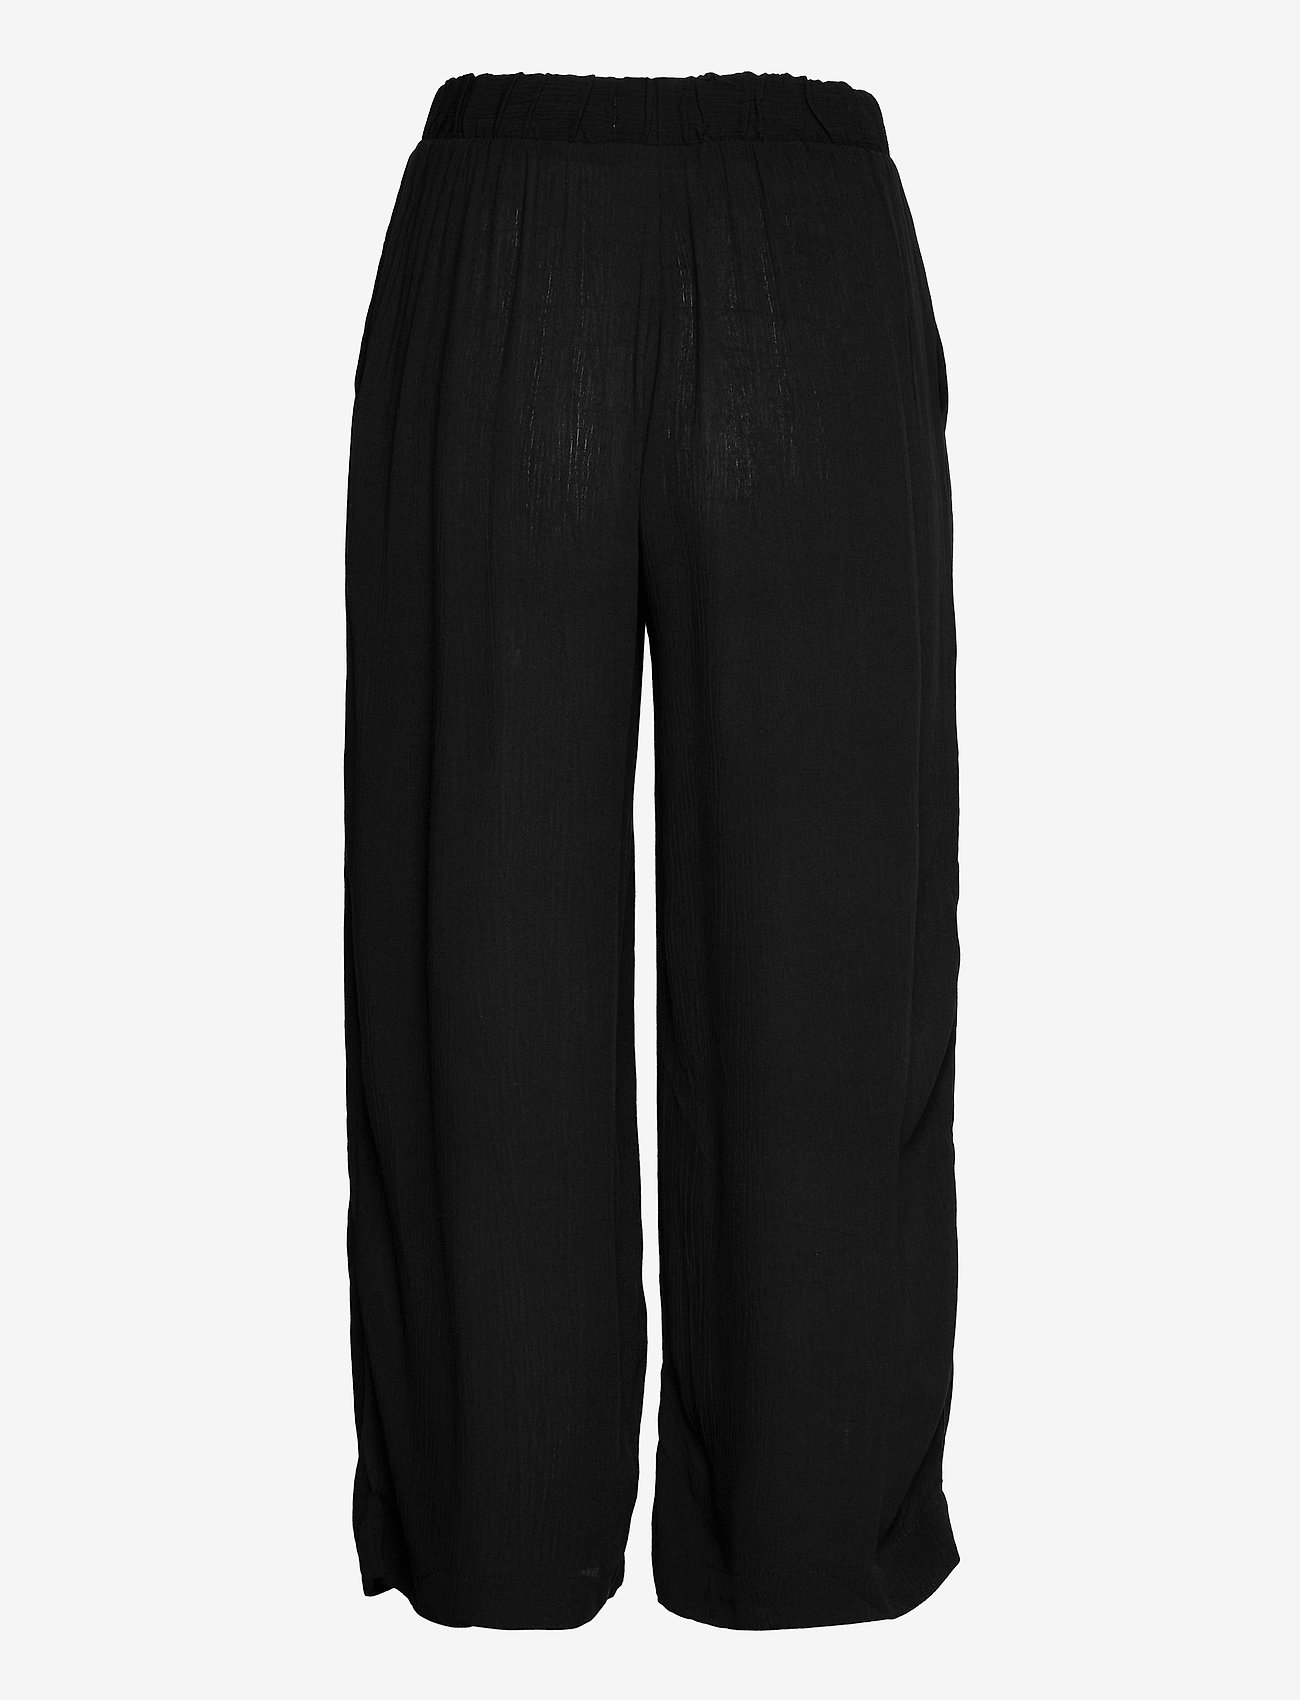 ICHI - IHMARRAKECH SO PA - casual trousers - black - 1